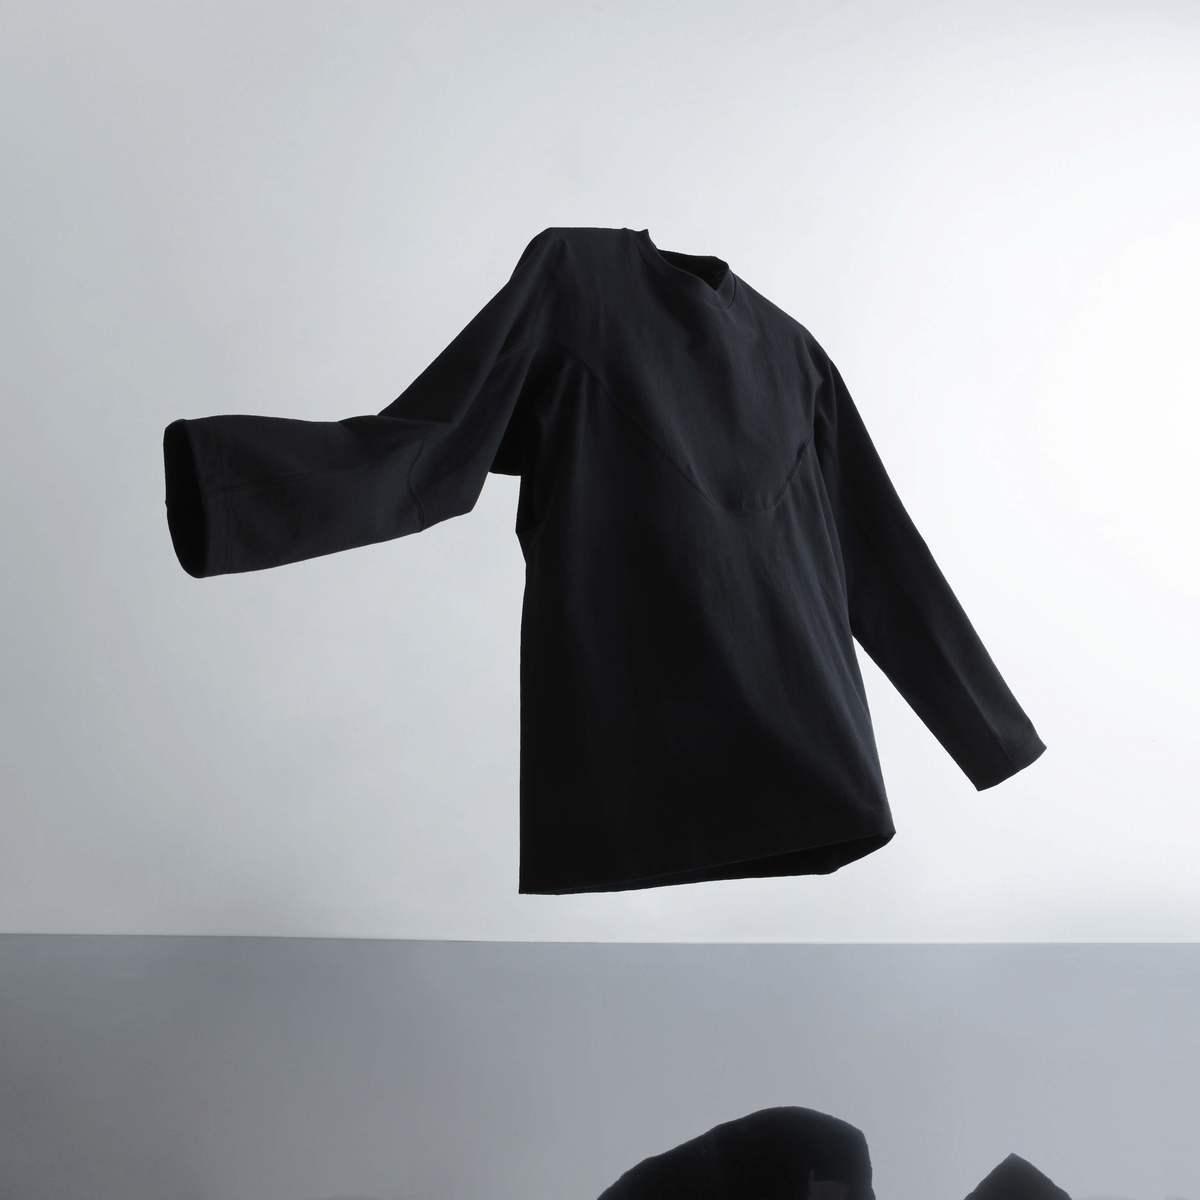 A-GIRLS ATMOS Pinnacle Long Sleeve Line Tee(エイガールズ アトモス ピナクル ロングスリーブ ティーシャツ)(BLACK)19SS-S